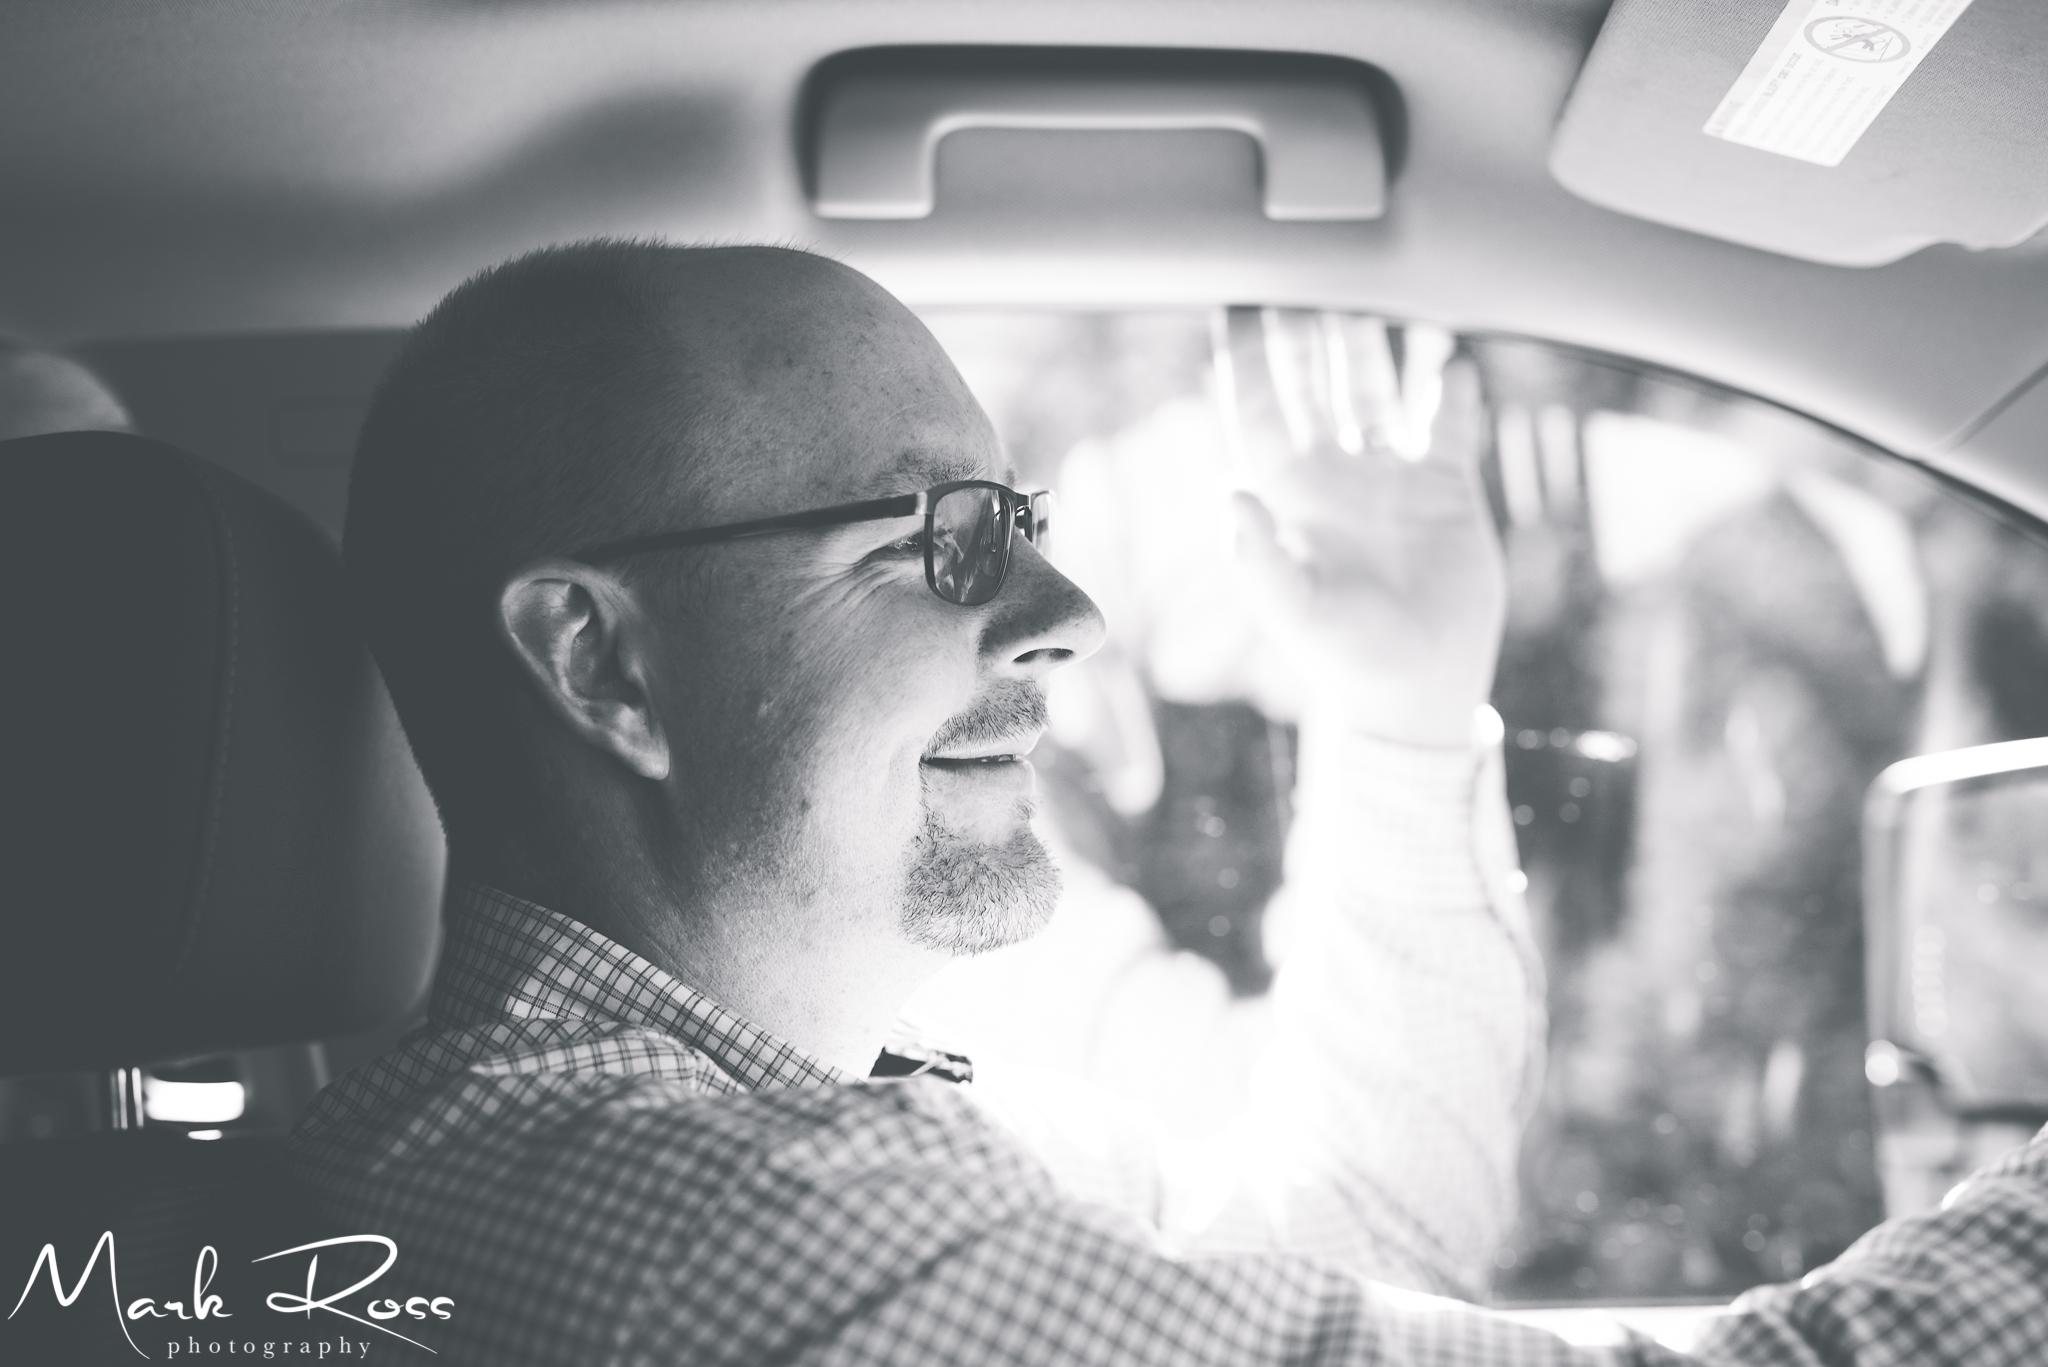 Brett driving. Obviously.